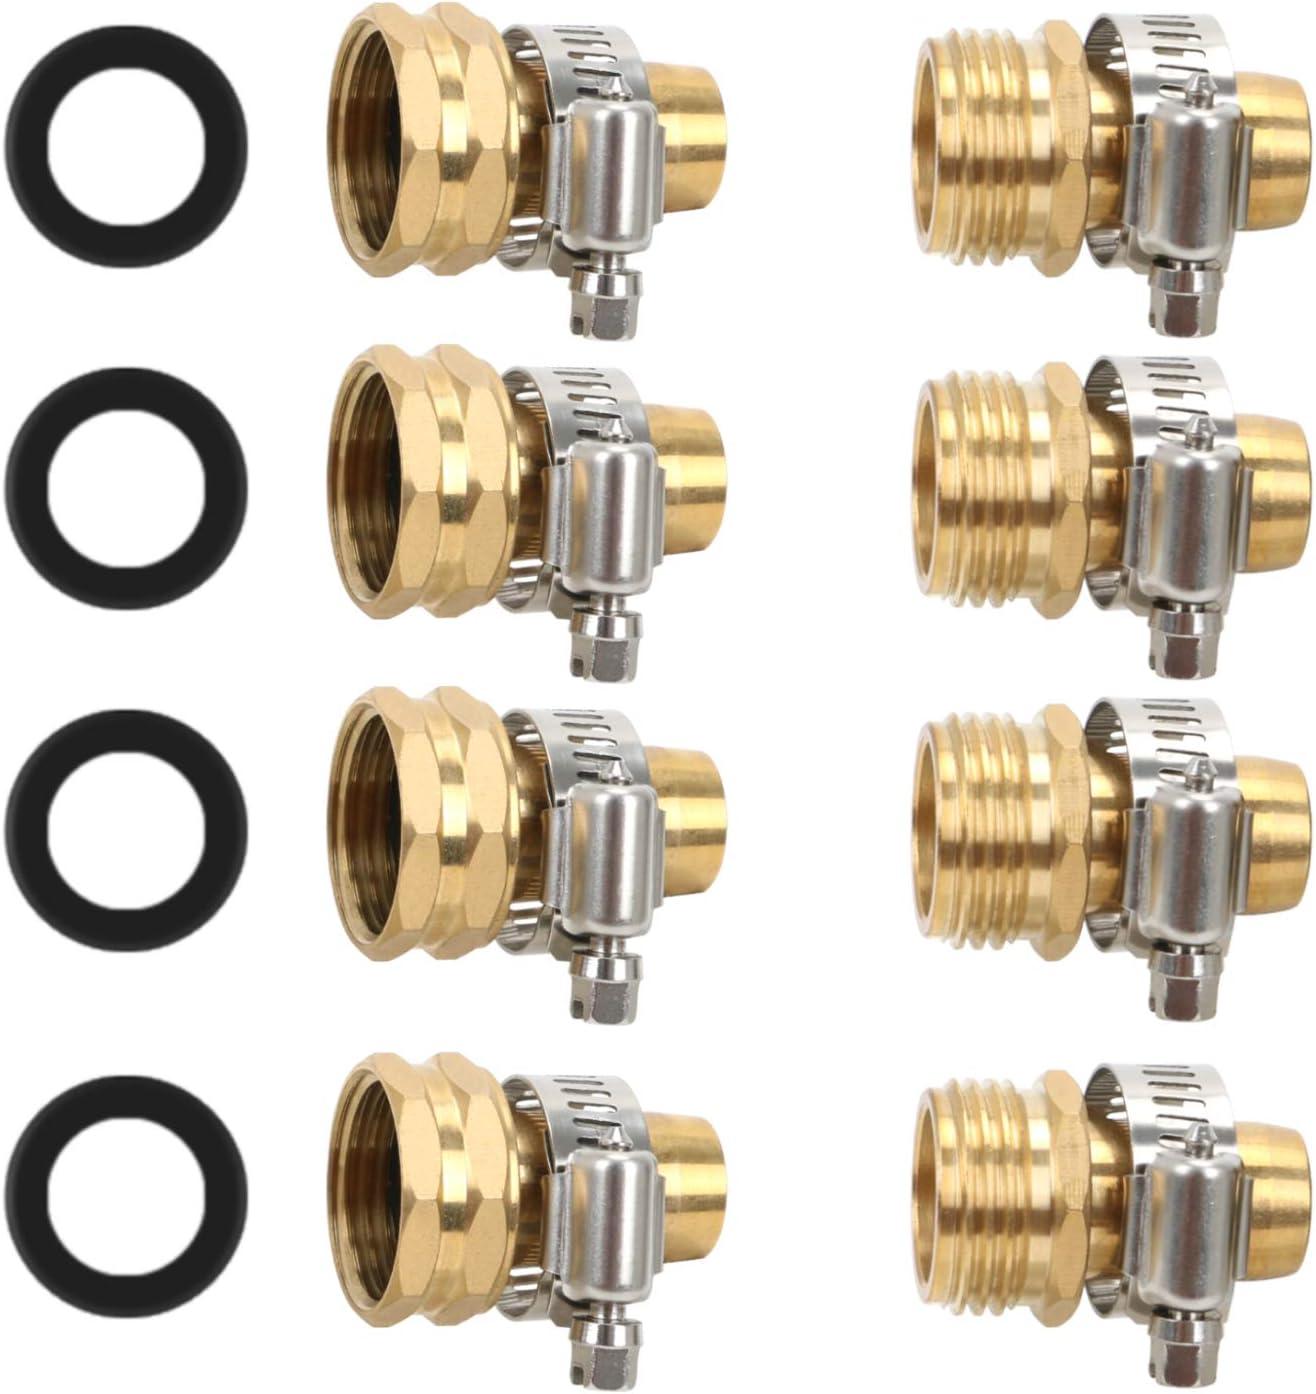 STYDDI Garden Hose Repair Kit Solid Female online shop Max 81% OFF Mal and Brass Mender